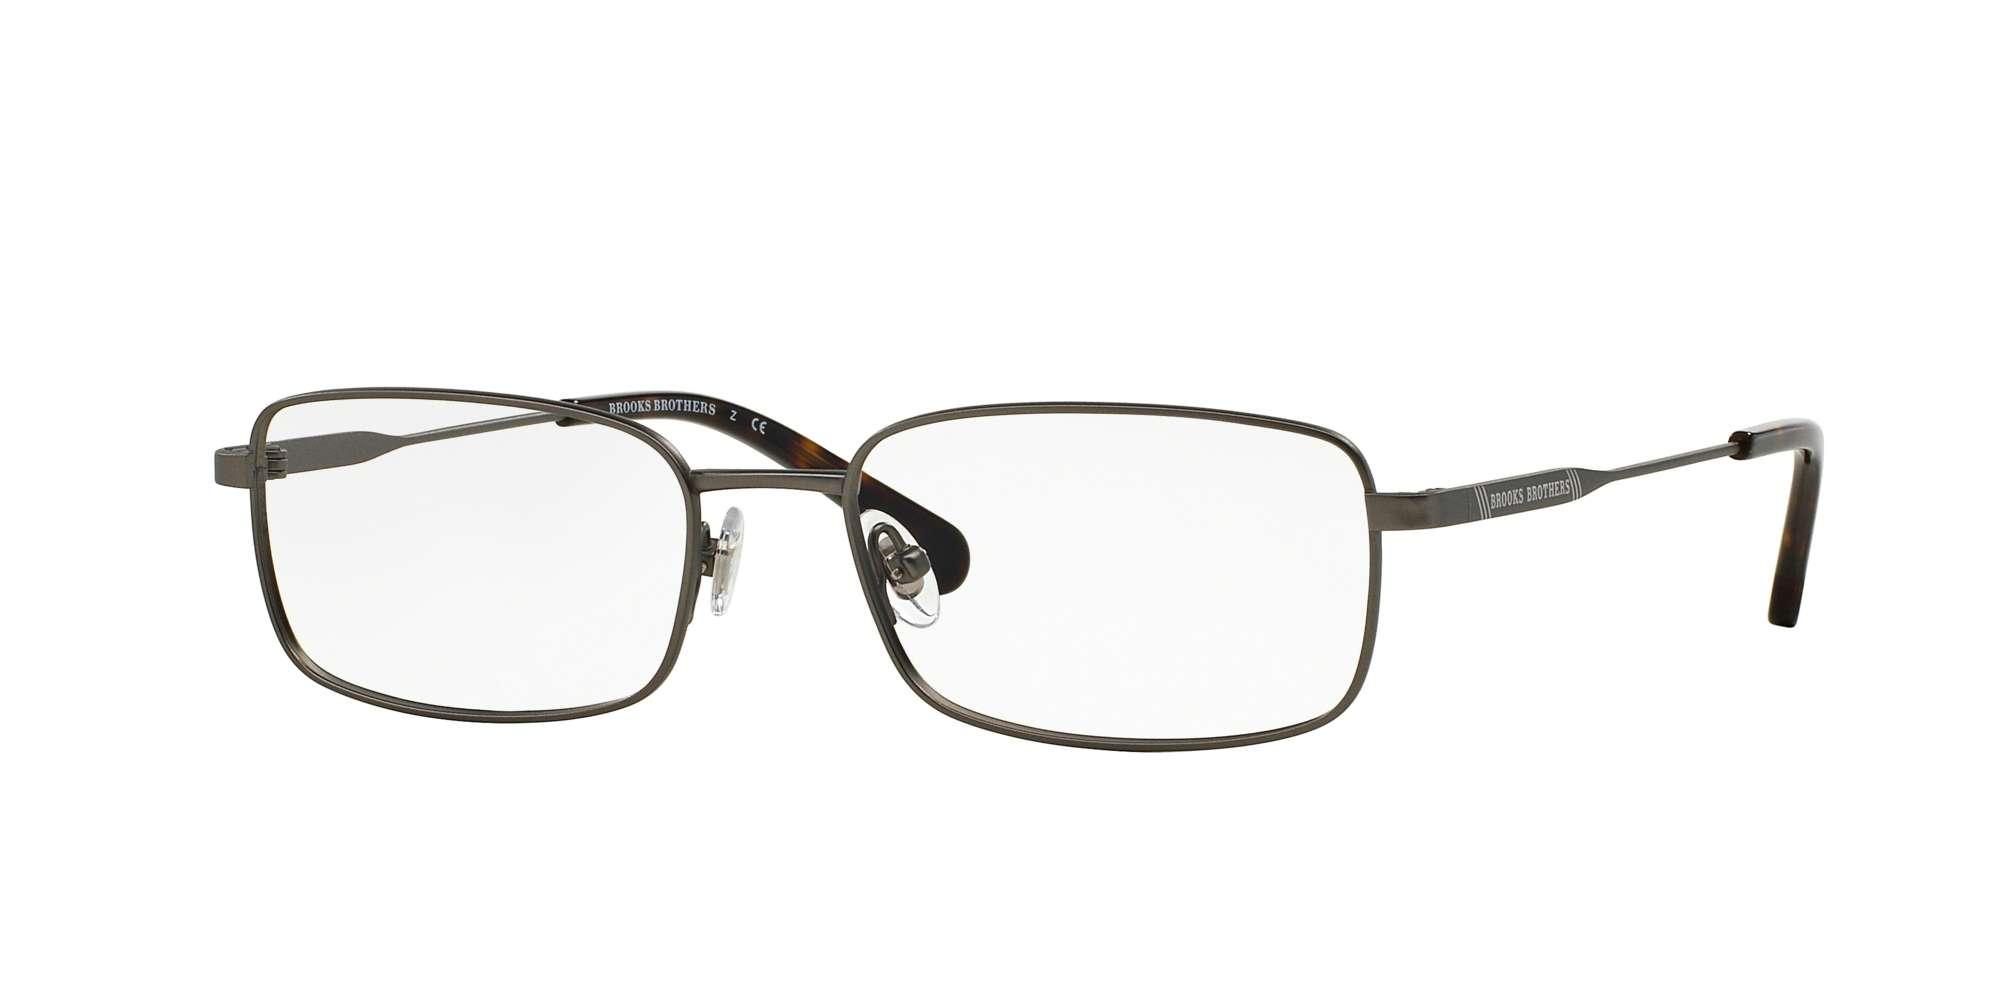 0bf77f361cb5 Brooks Brothers BB1037T Prescription Eyeglasses | 1-800-GET-LENS